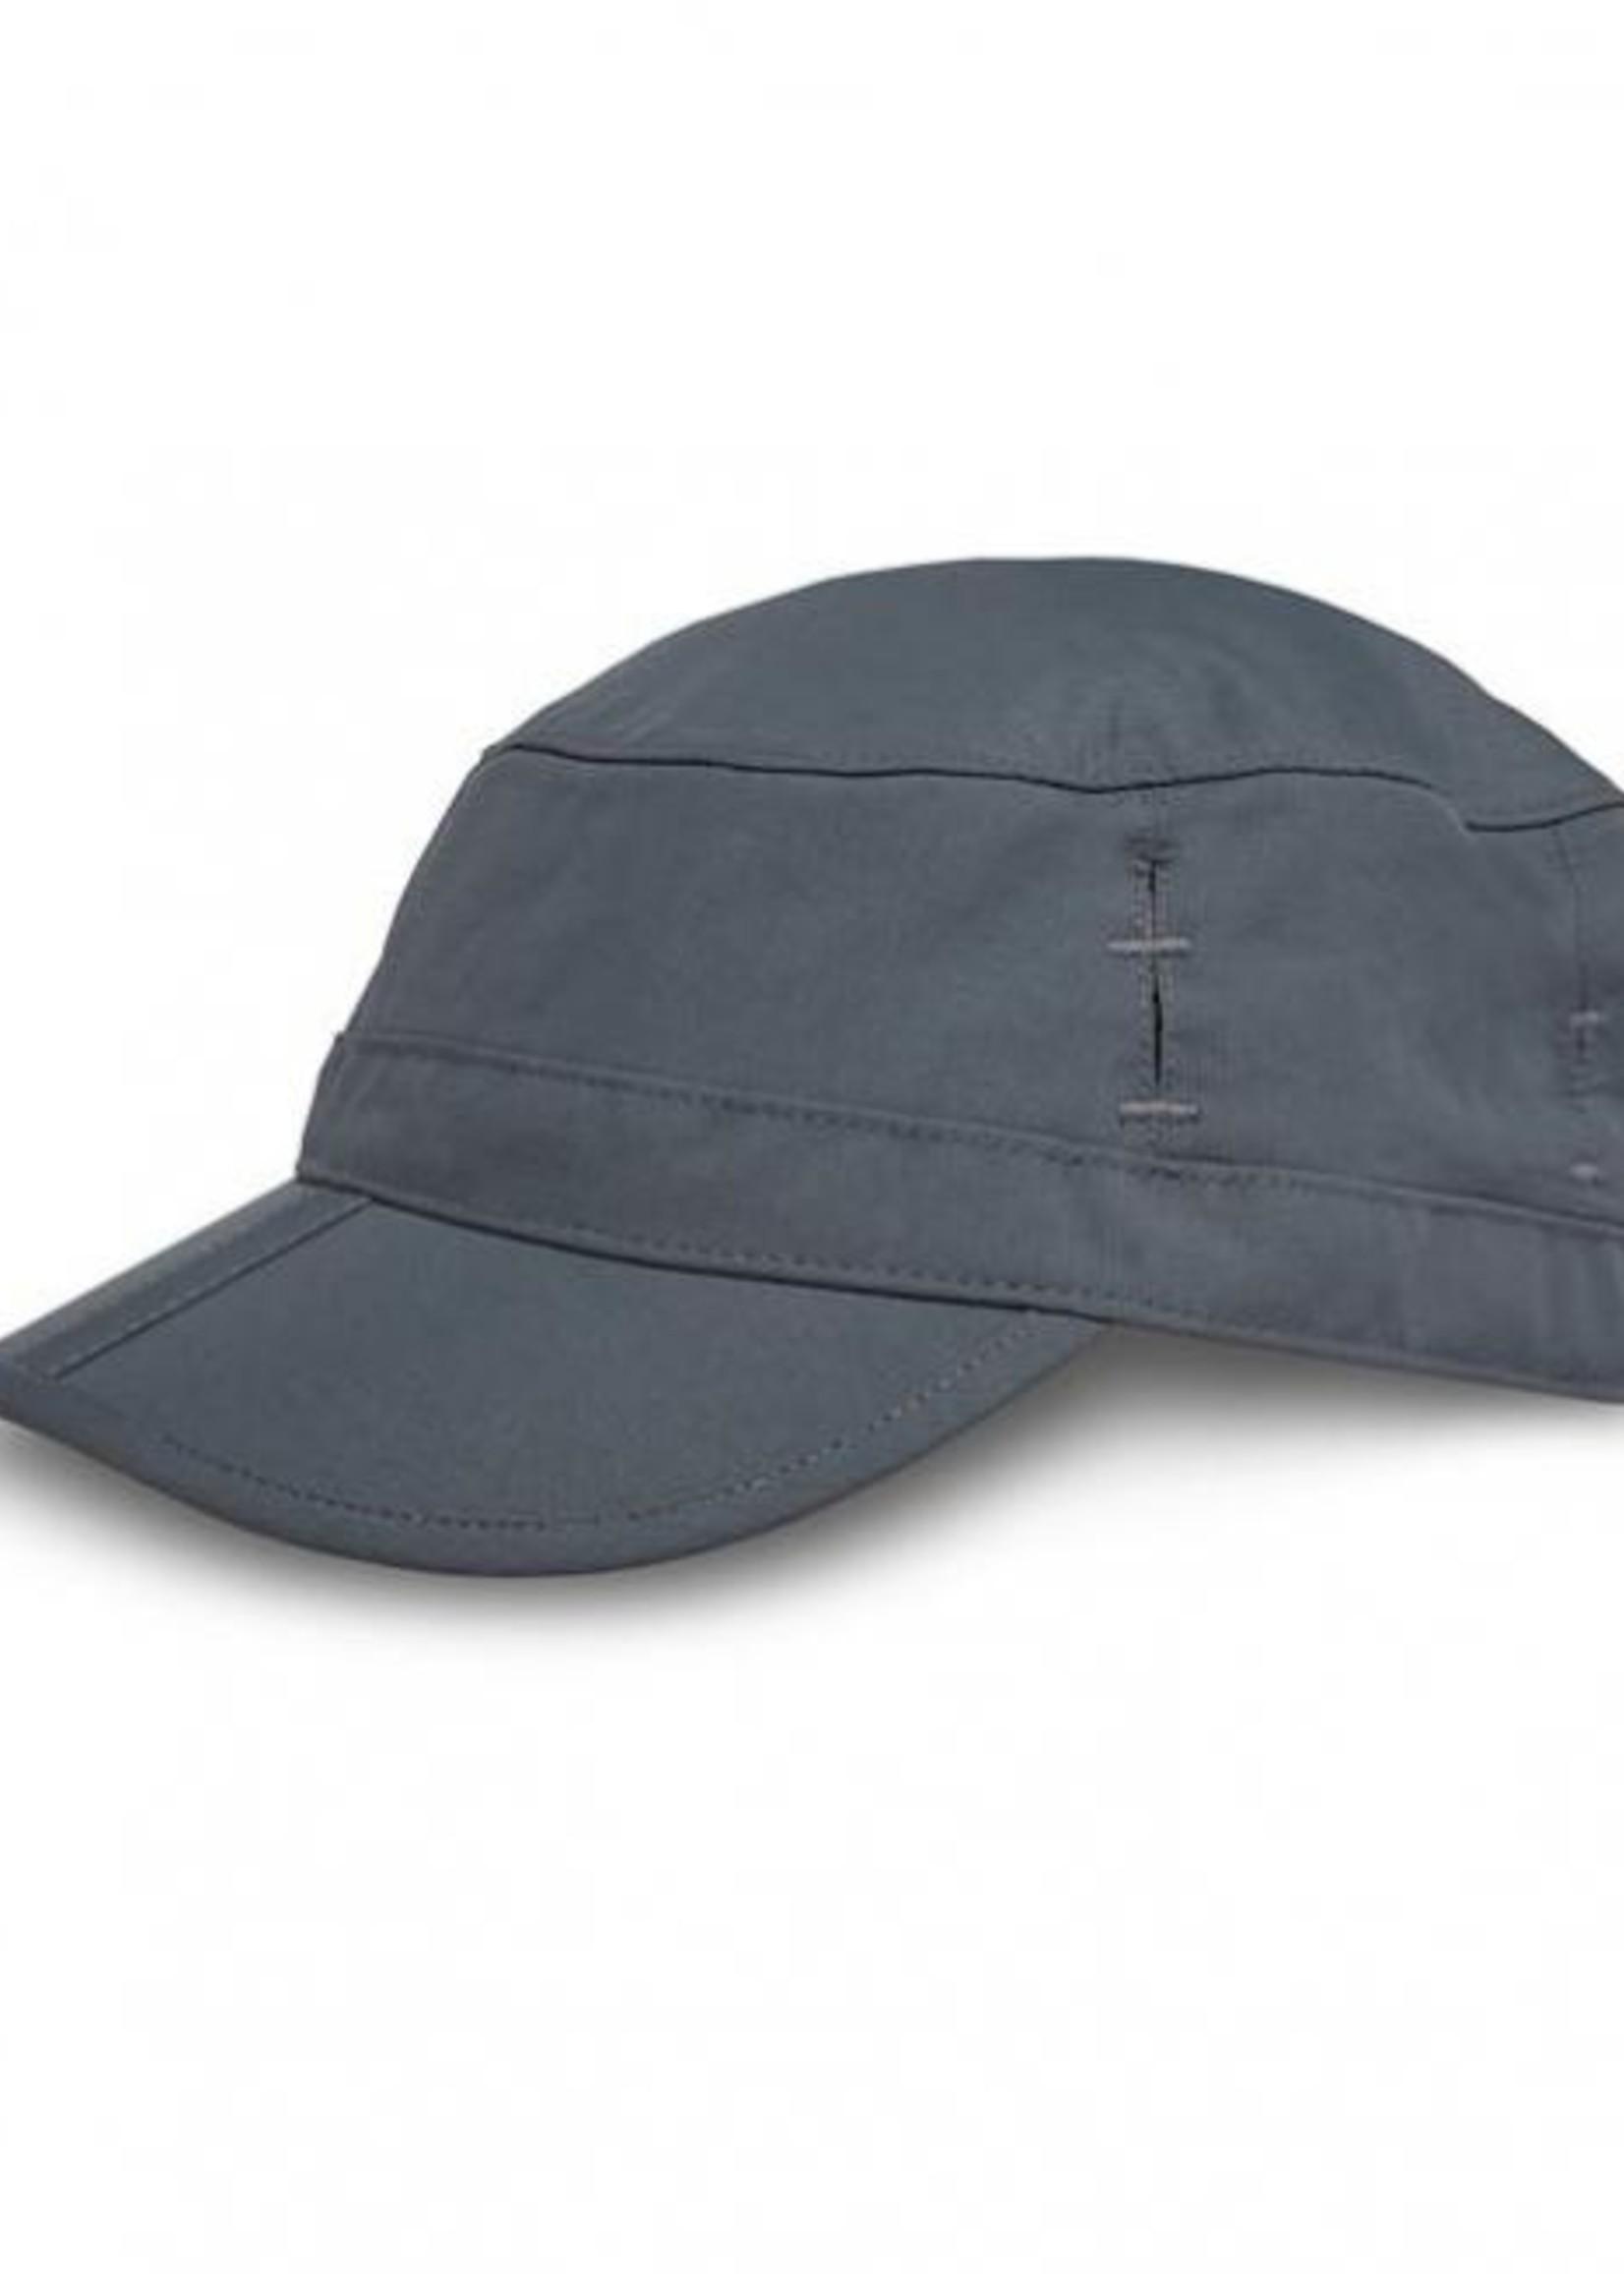 Sunday Afternoons SUN TRIPPER CAP